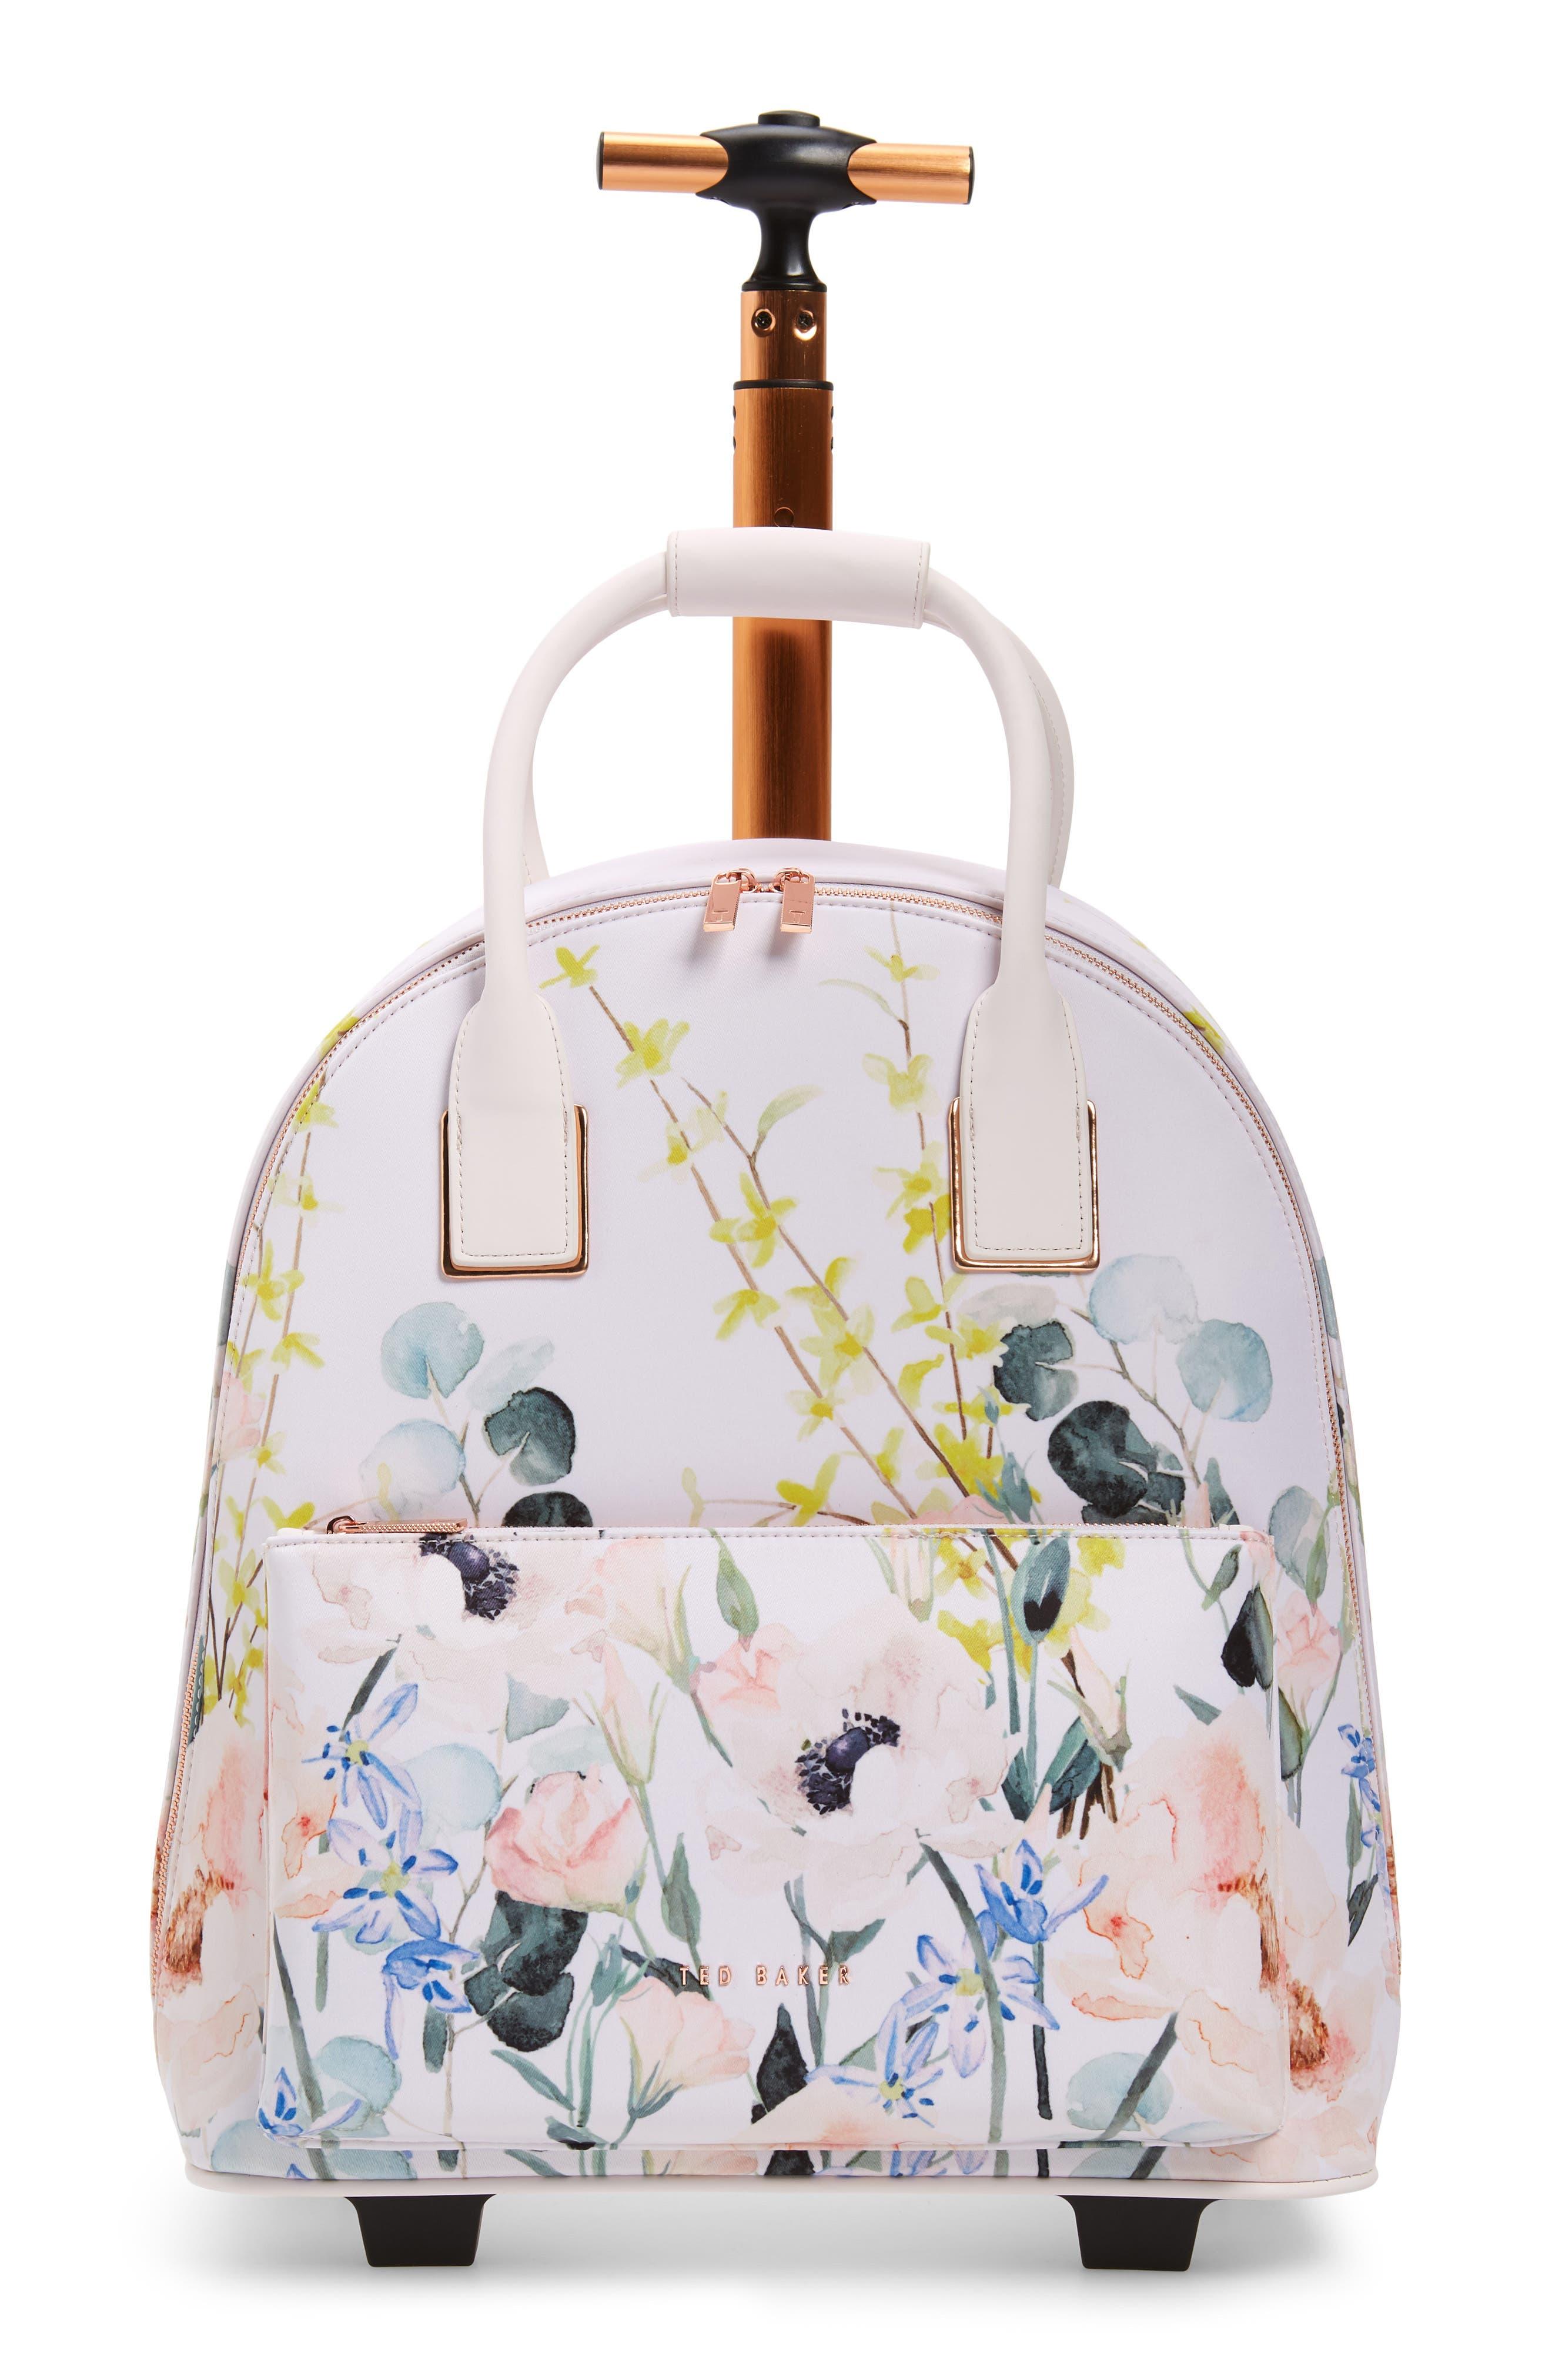 TED BAKER LONDON, Elianna Elegant Travel Bag, Main thumbnail 1, color, NUDE PINK